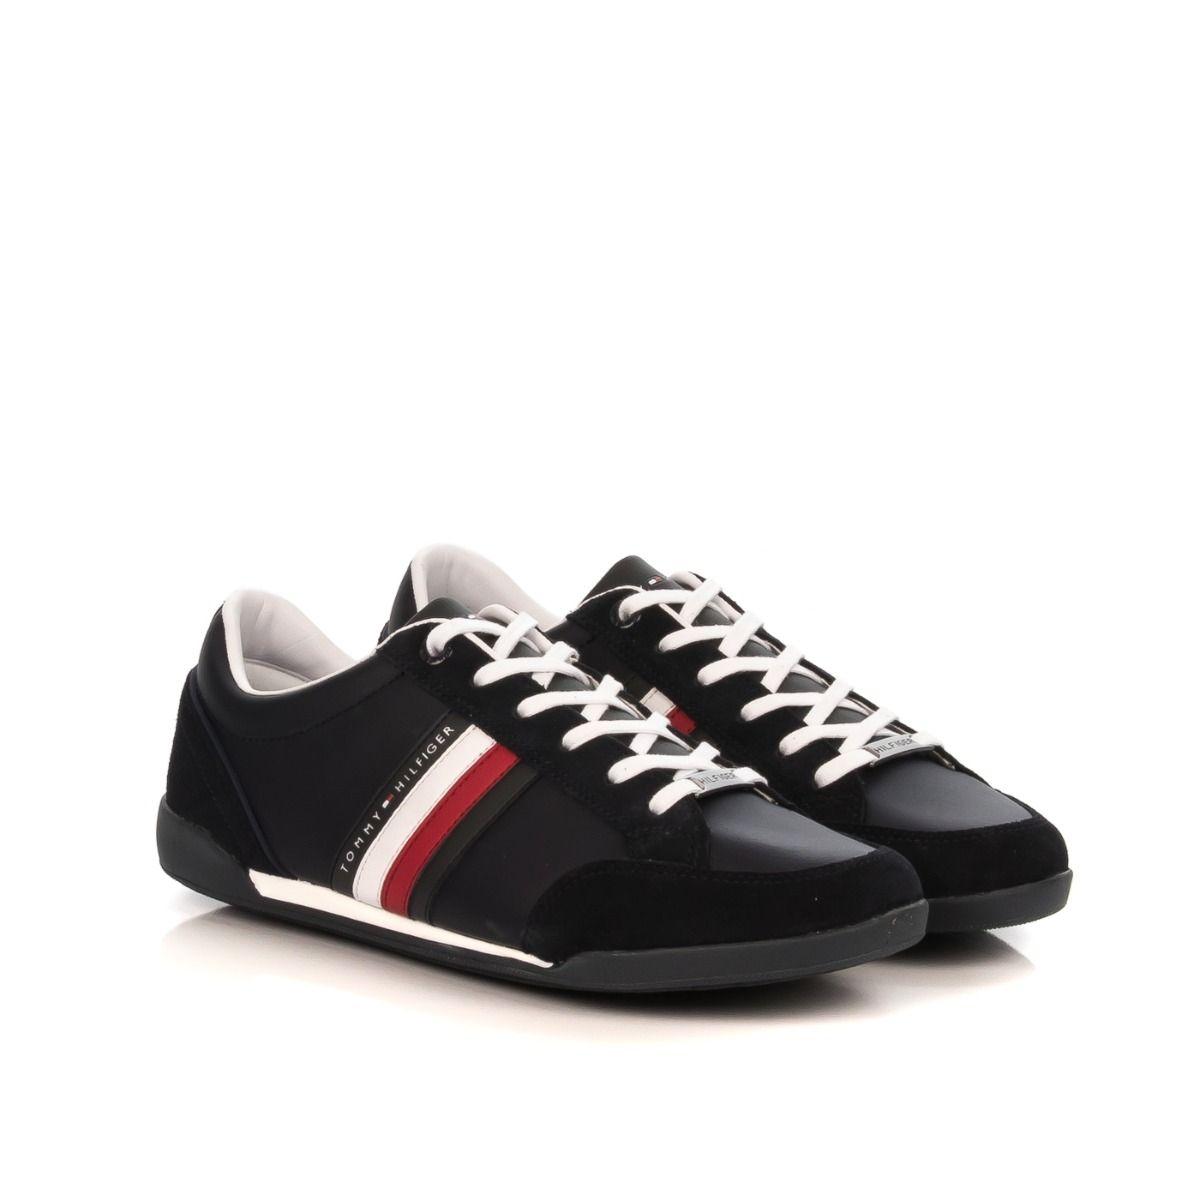 the best attitude f5a83 26c57 Sneakers uomo|TOMMY HILFIGER 2046 403 blu|Spedizione ...